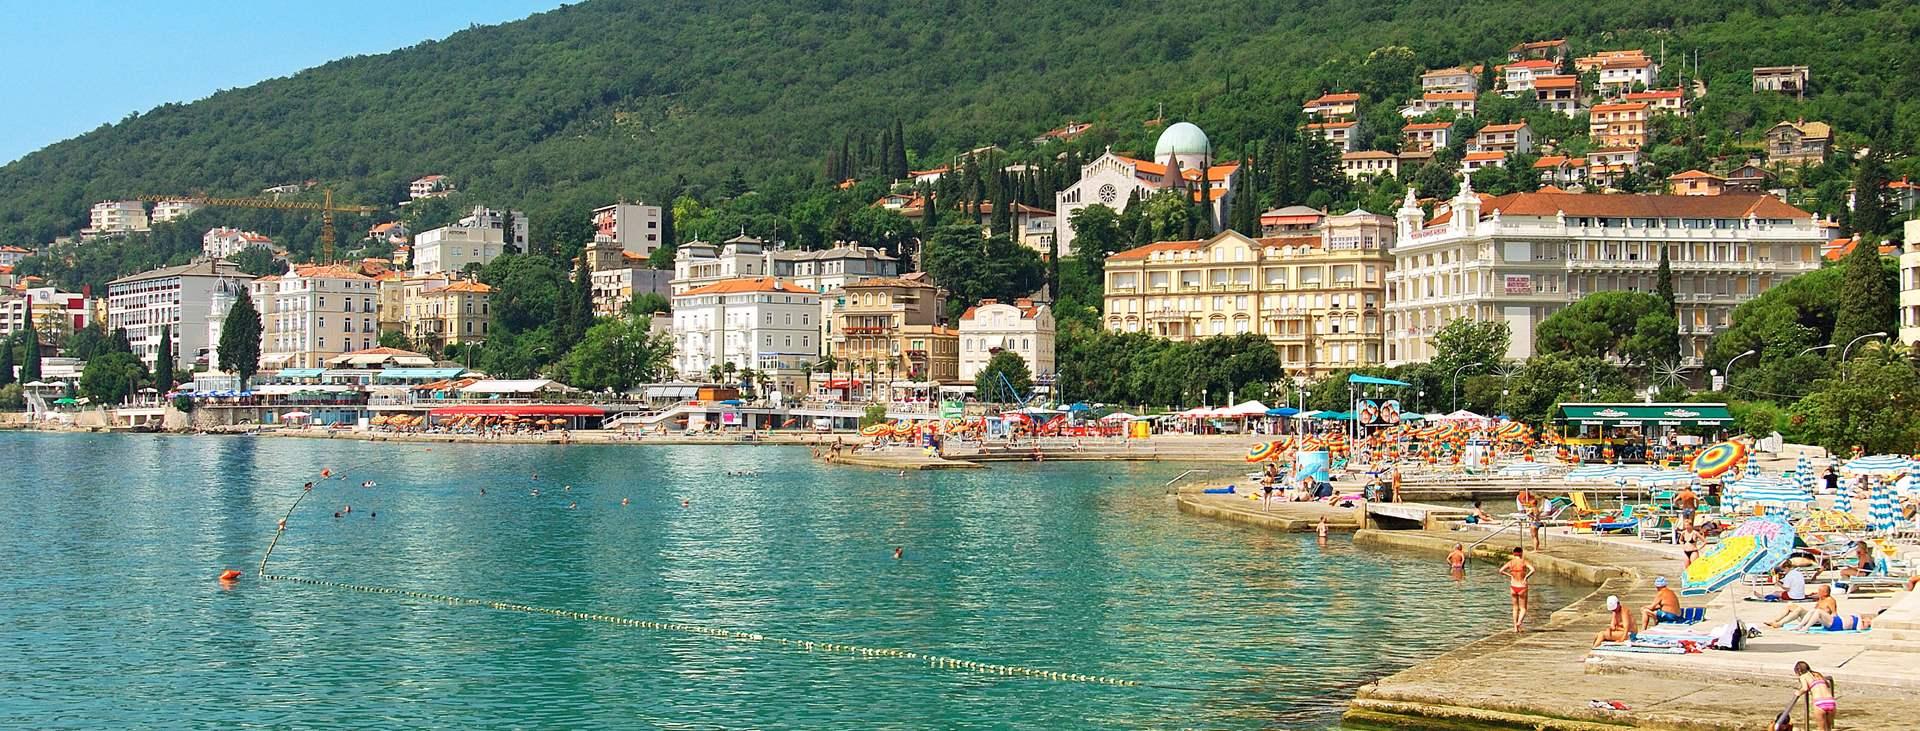 Reiser til Istria i Kroatia